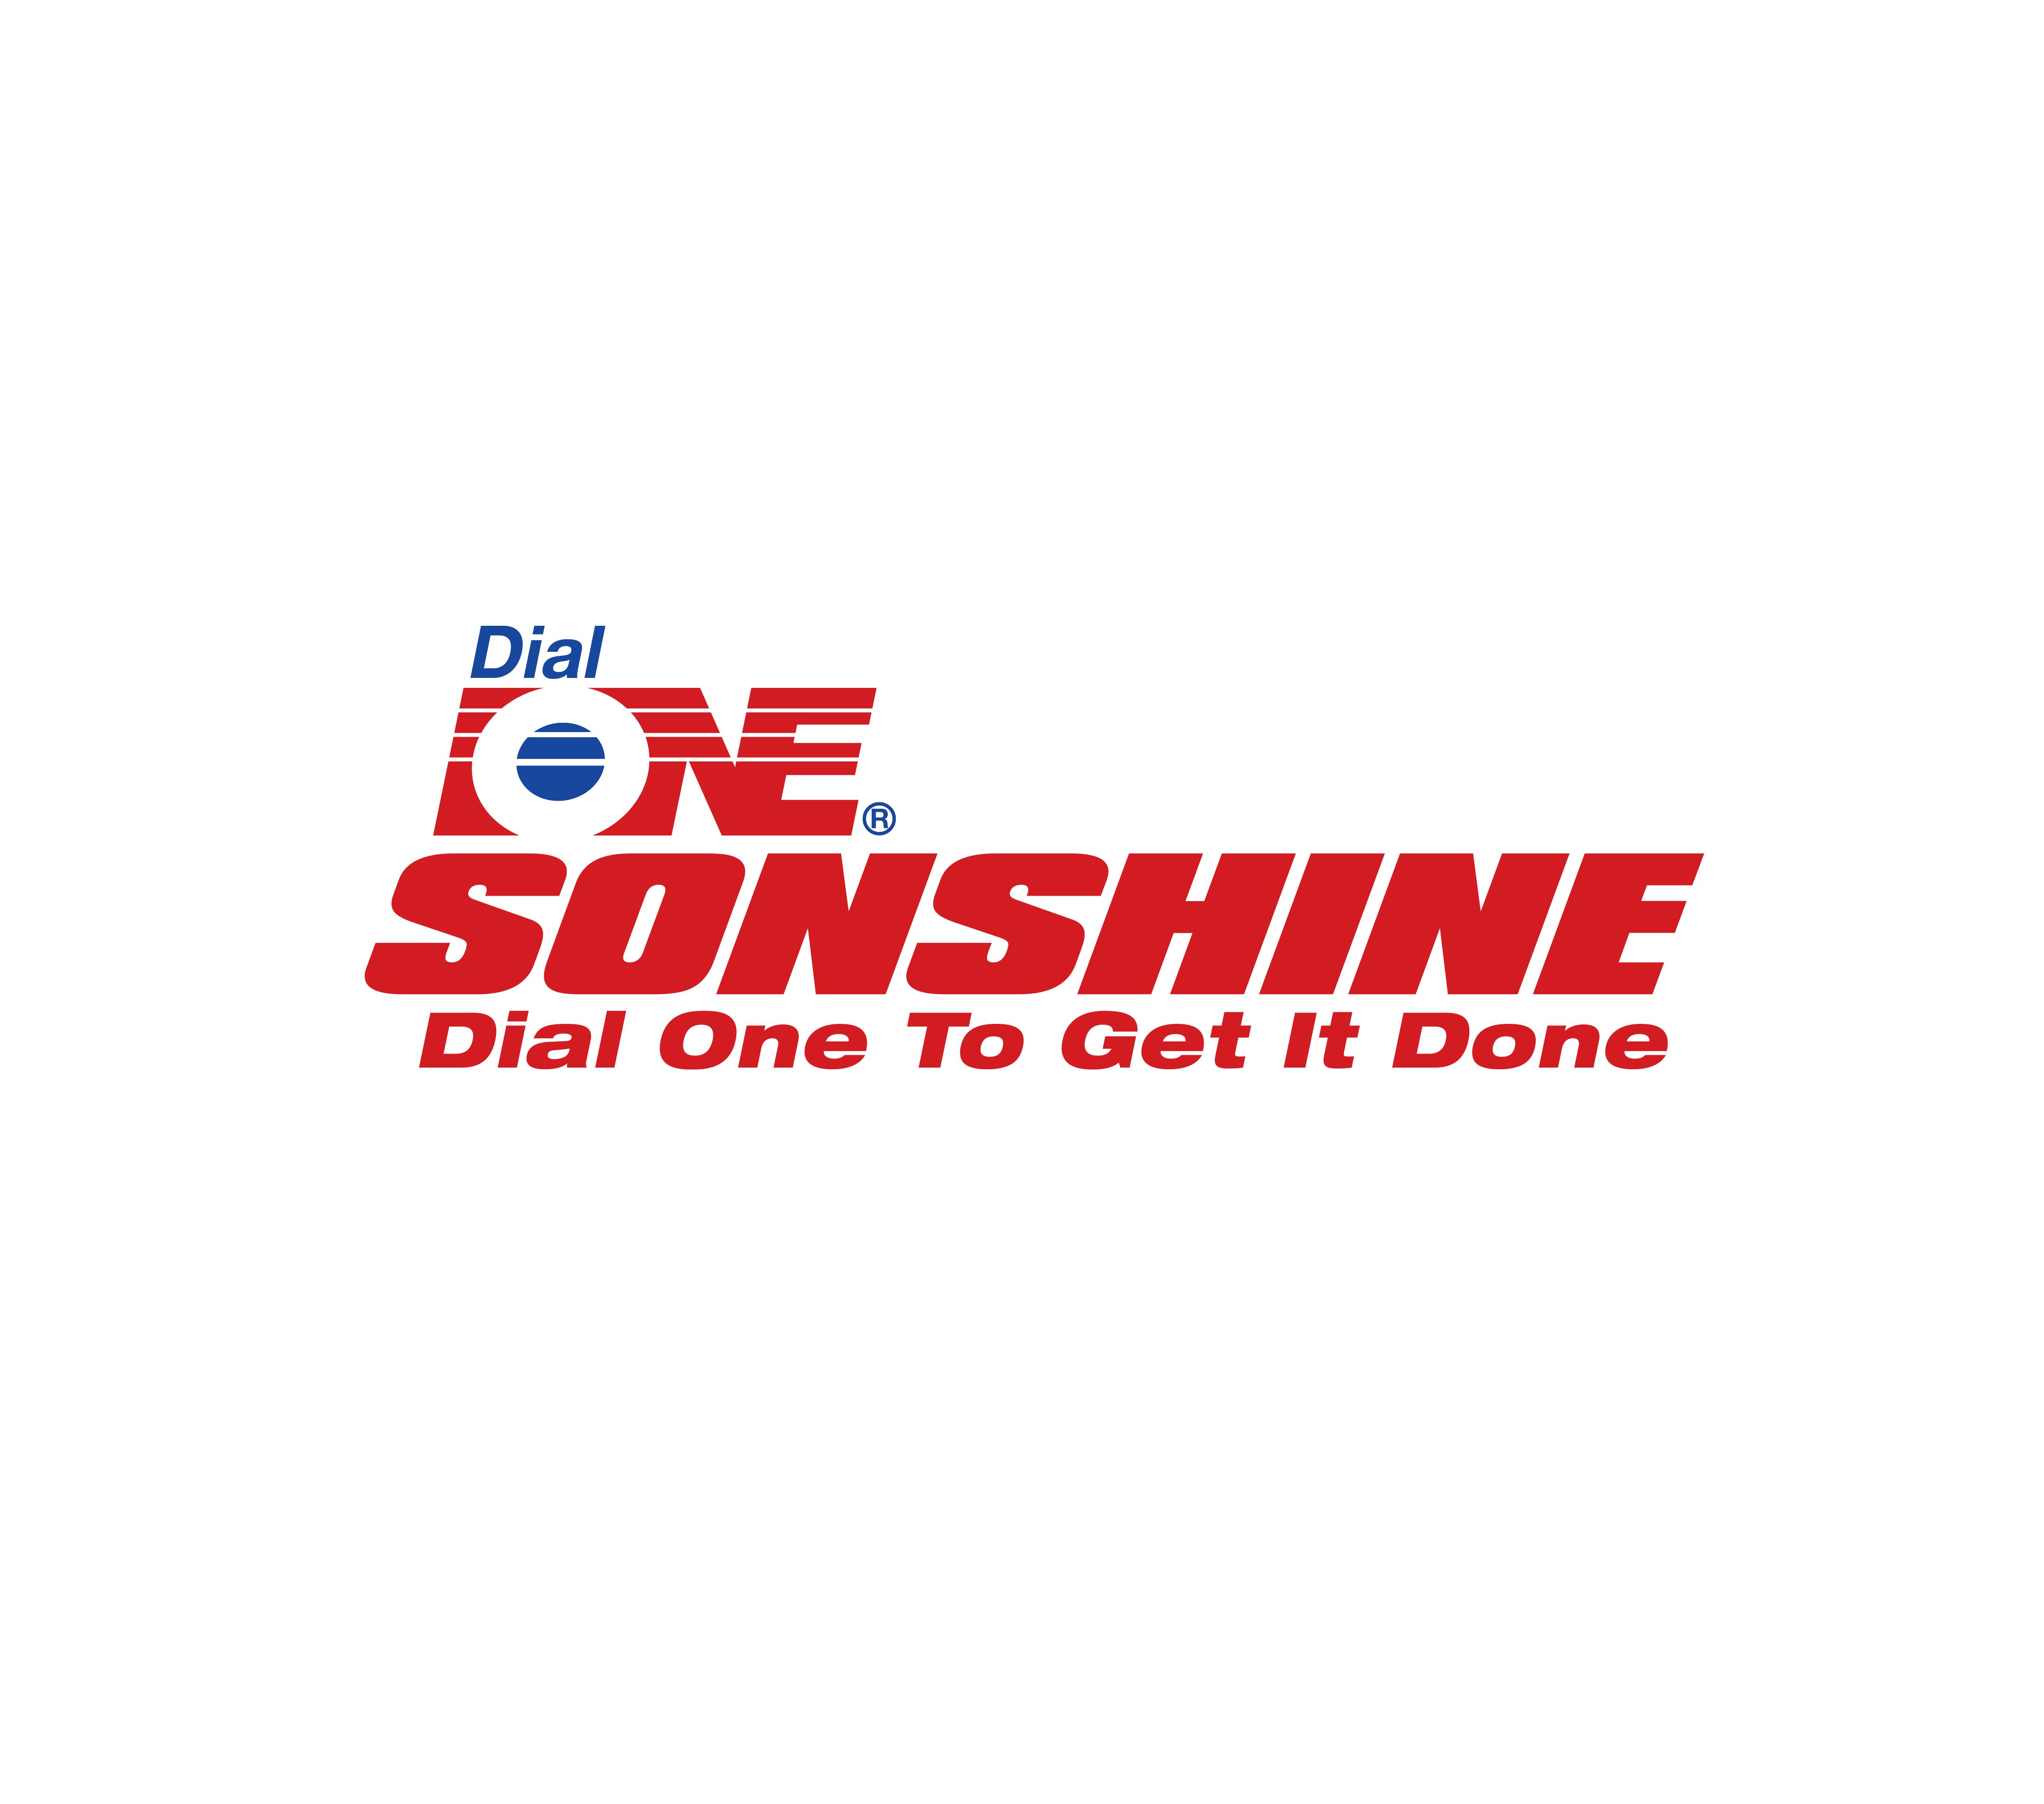 Dial One Sonshine - Stanton, CA